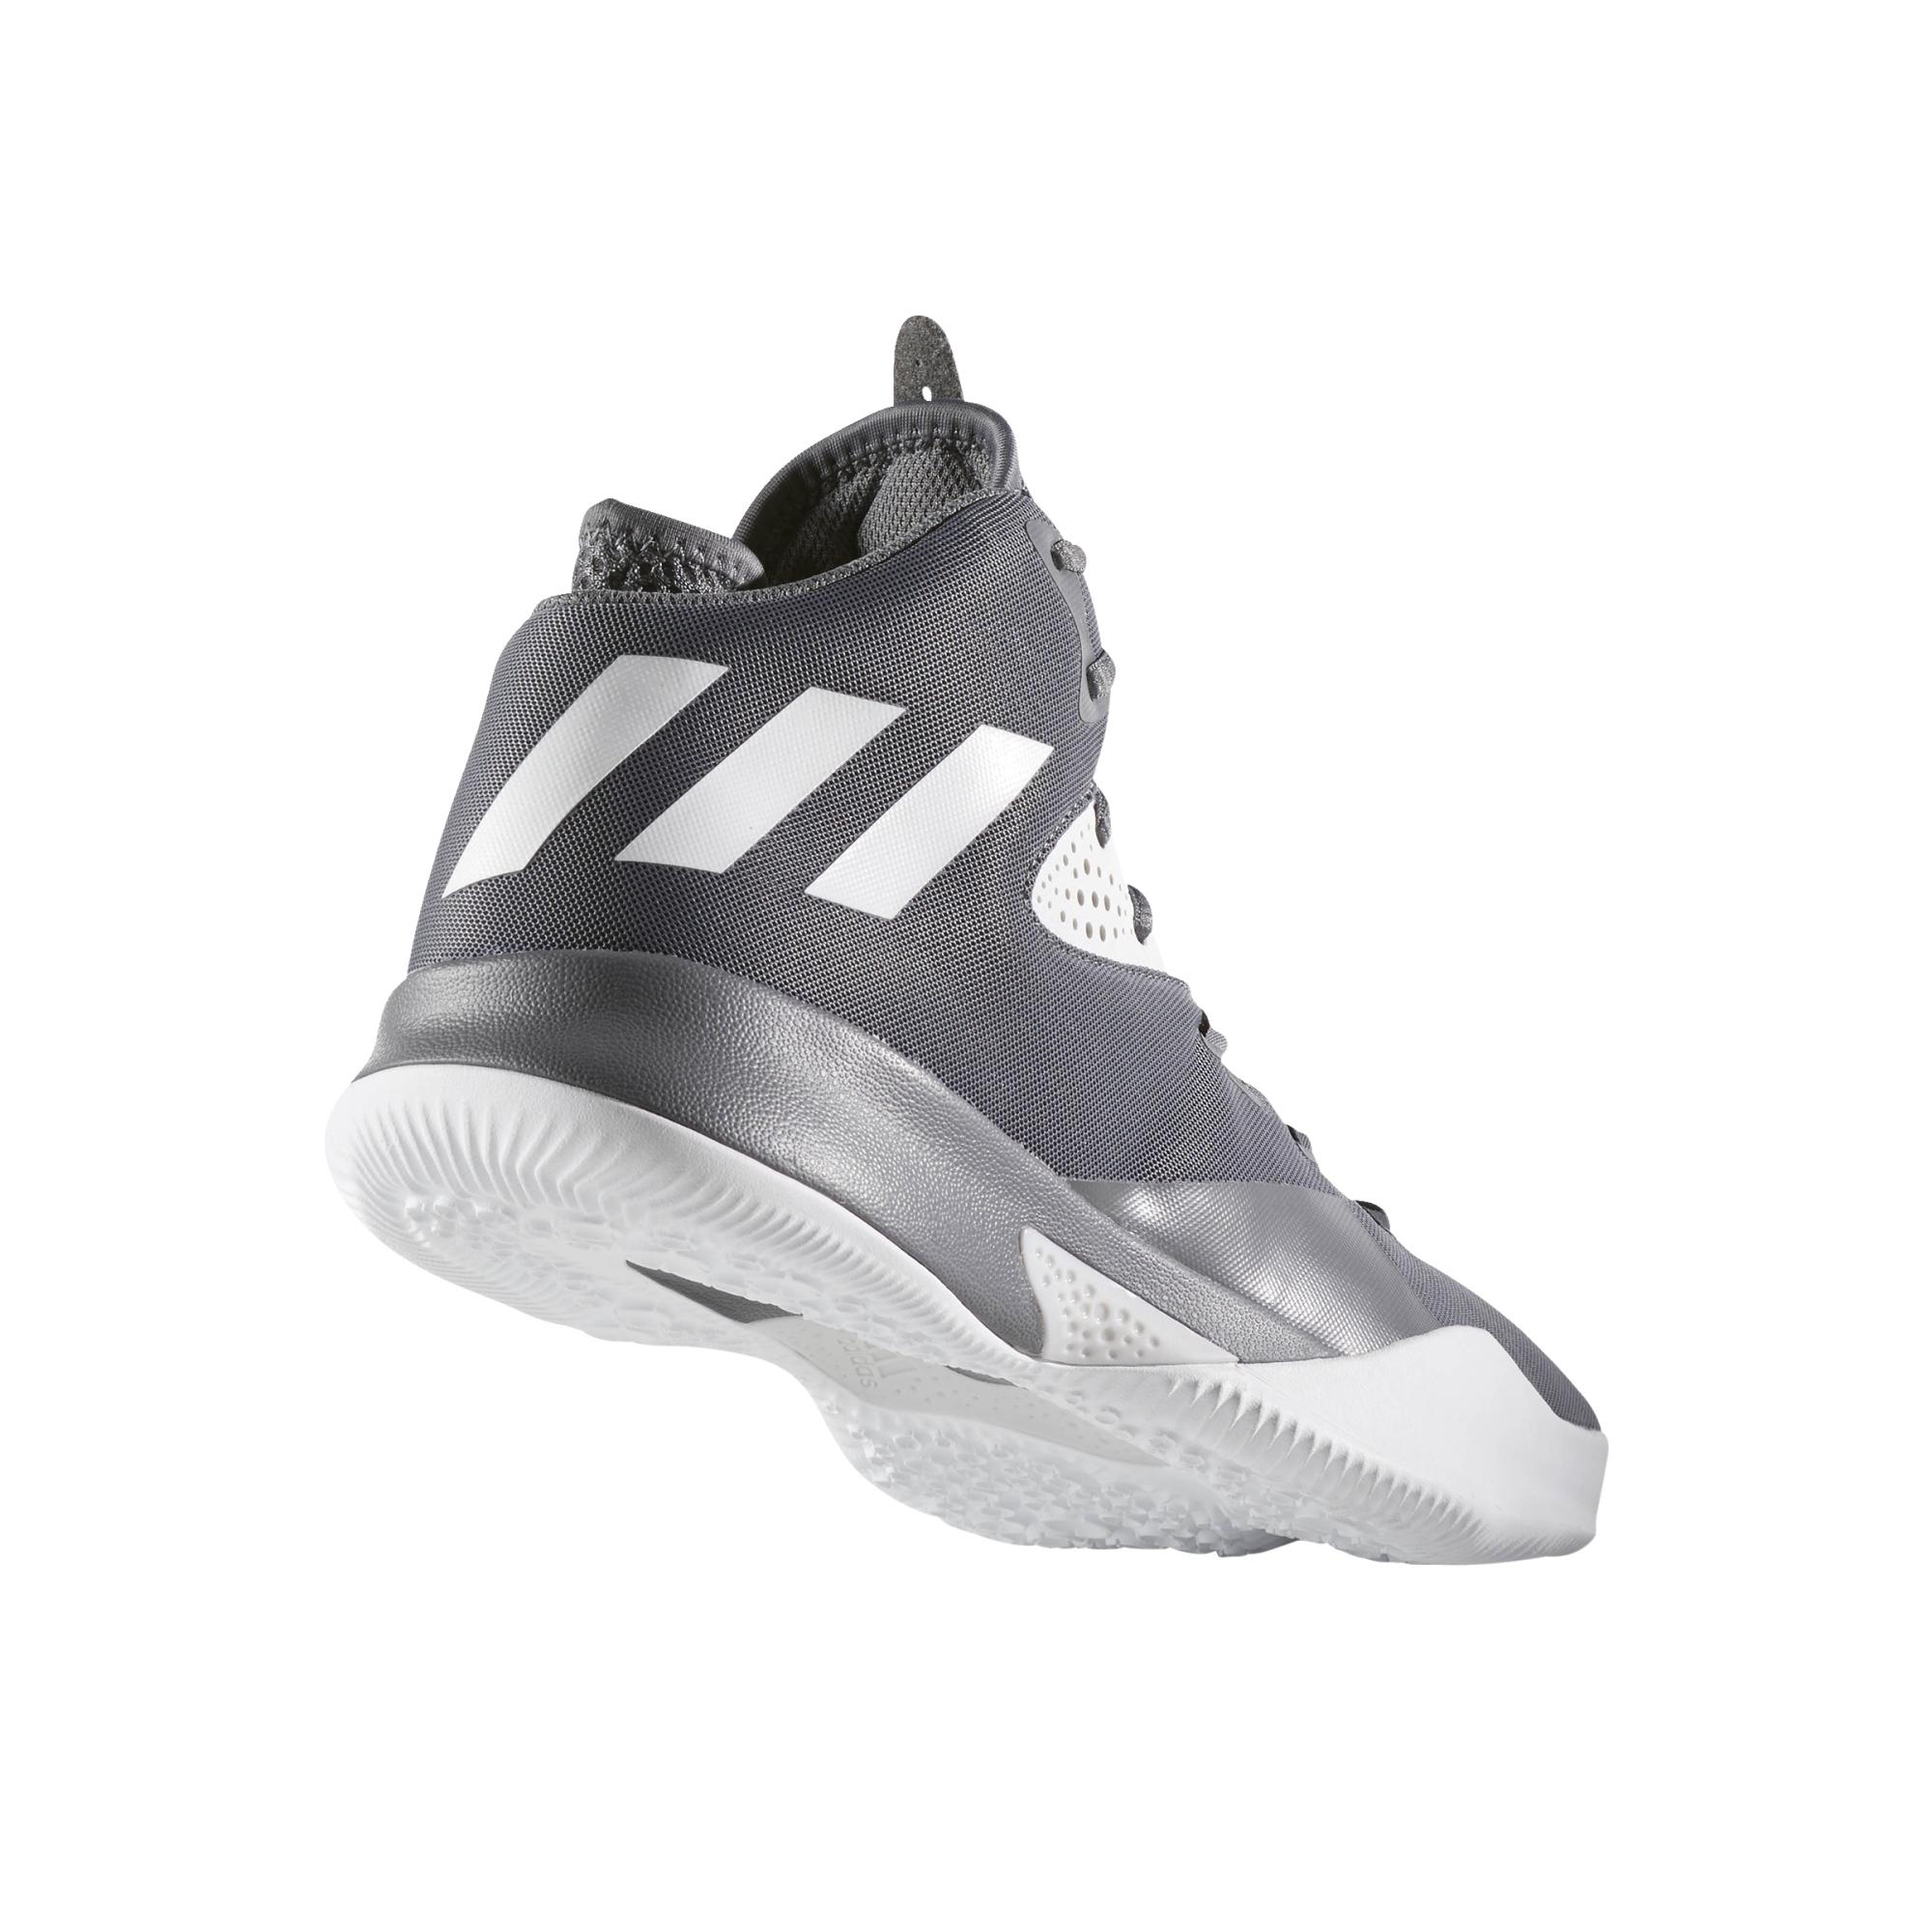 Adidas Zapatillas Dual Threat 2017